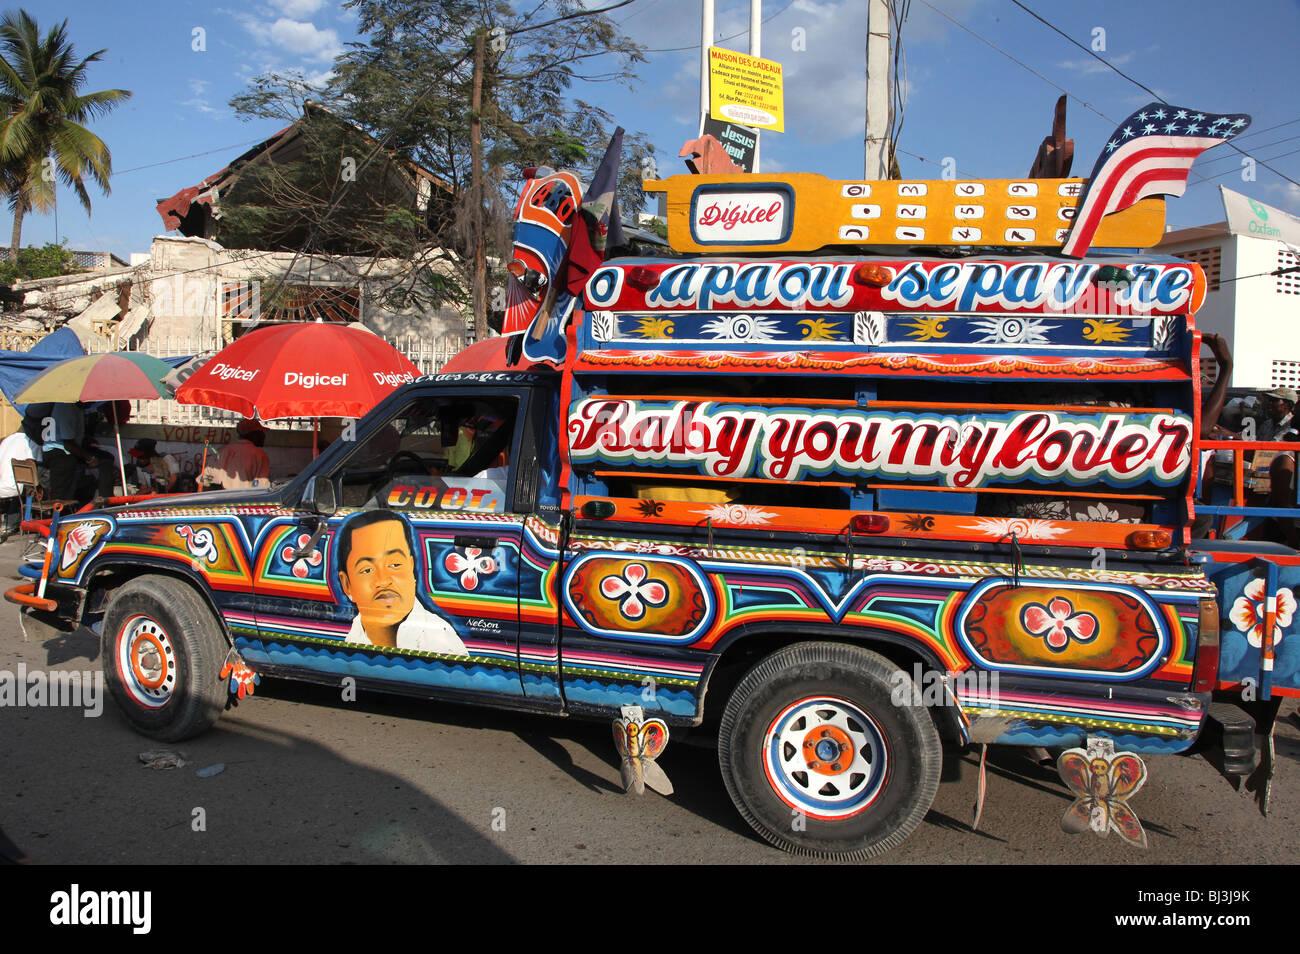 Tap tap taxi, Port au Prince, Haiti - Stock Image